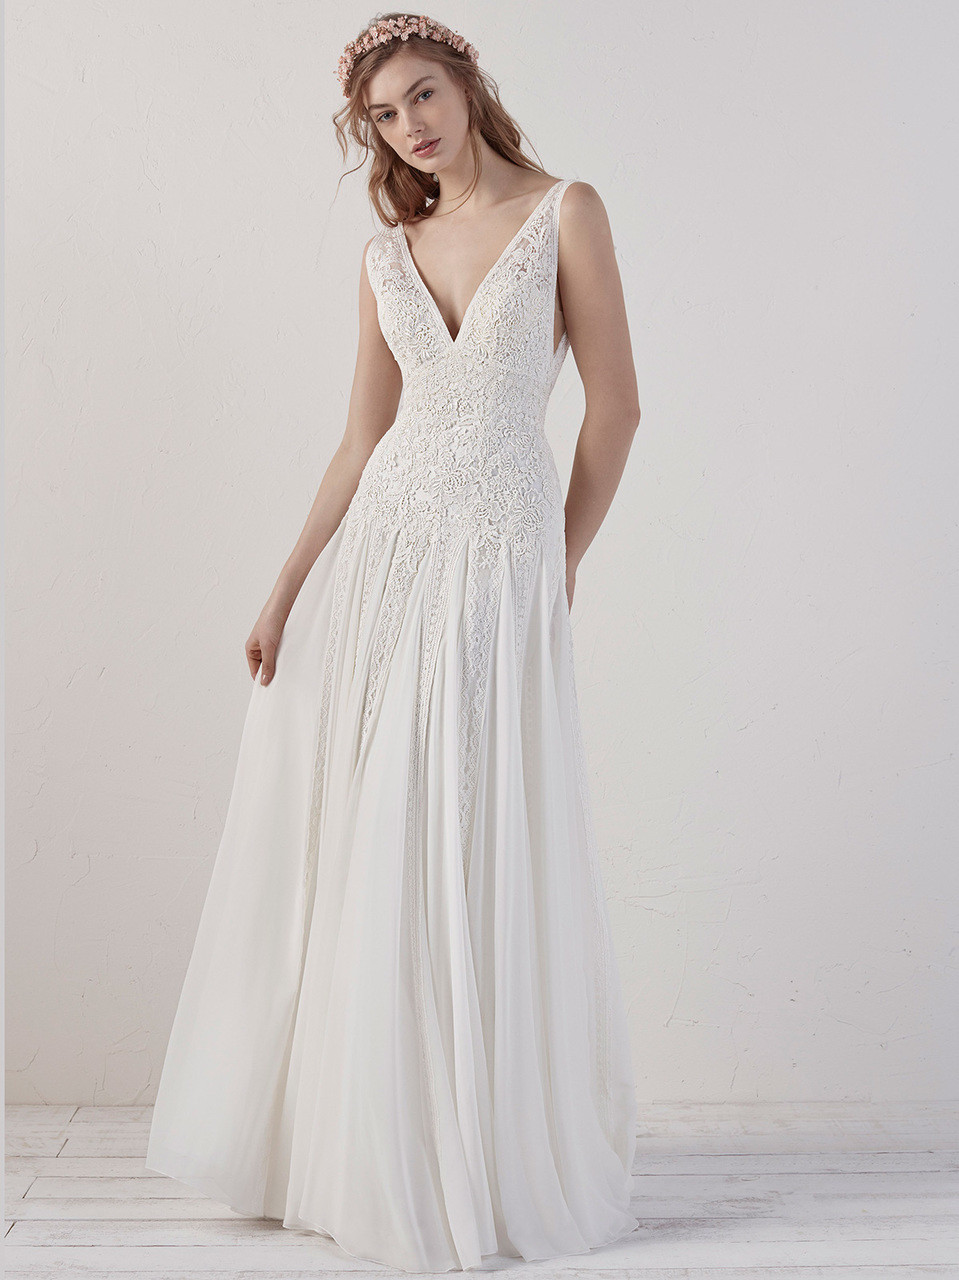 d7a7b6ec29a Pronovias Wedding Gown Eileen